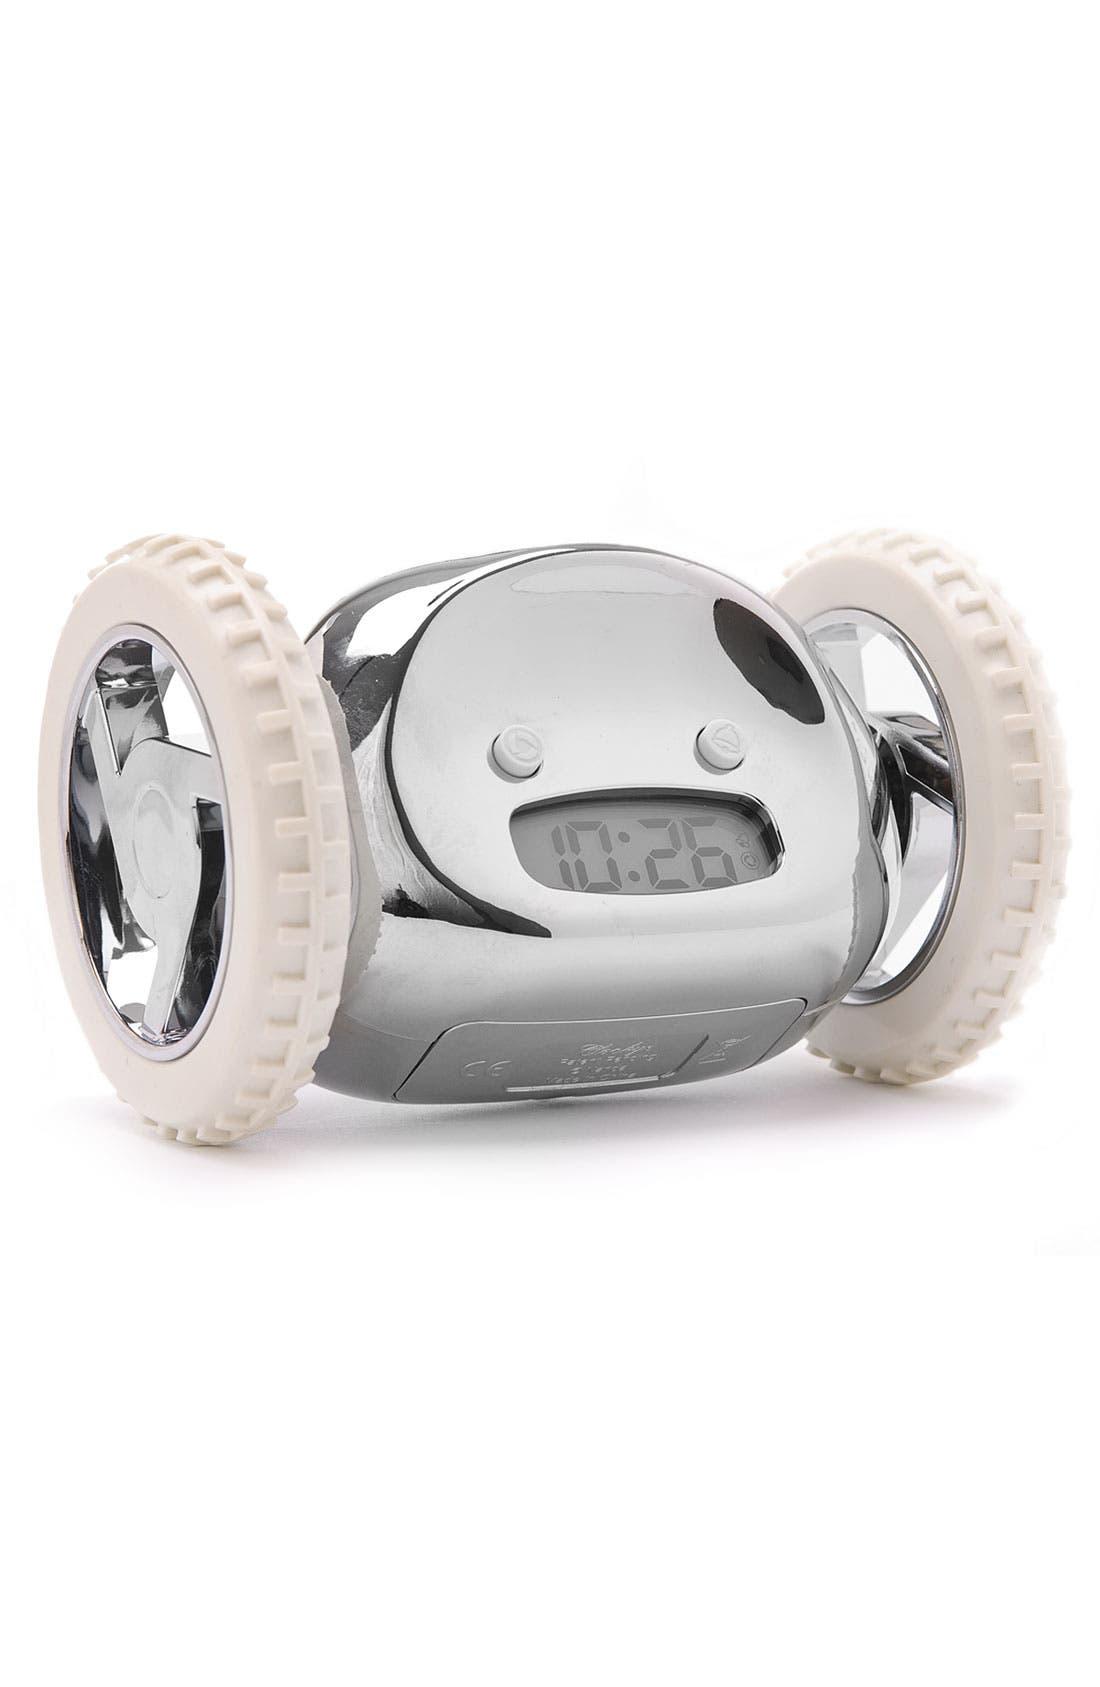 NANDA HOME 'Clocky' Alarm Clock, Main, color, 040